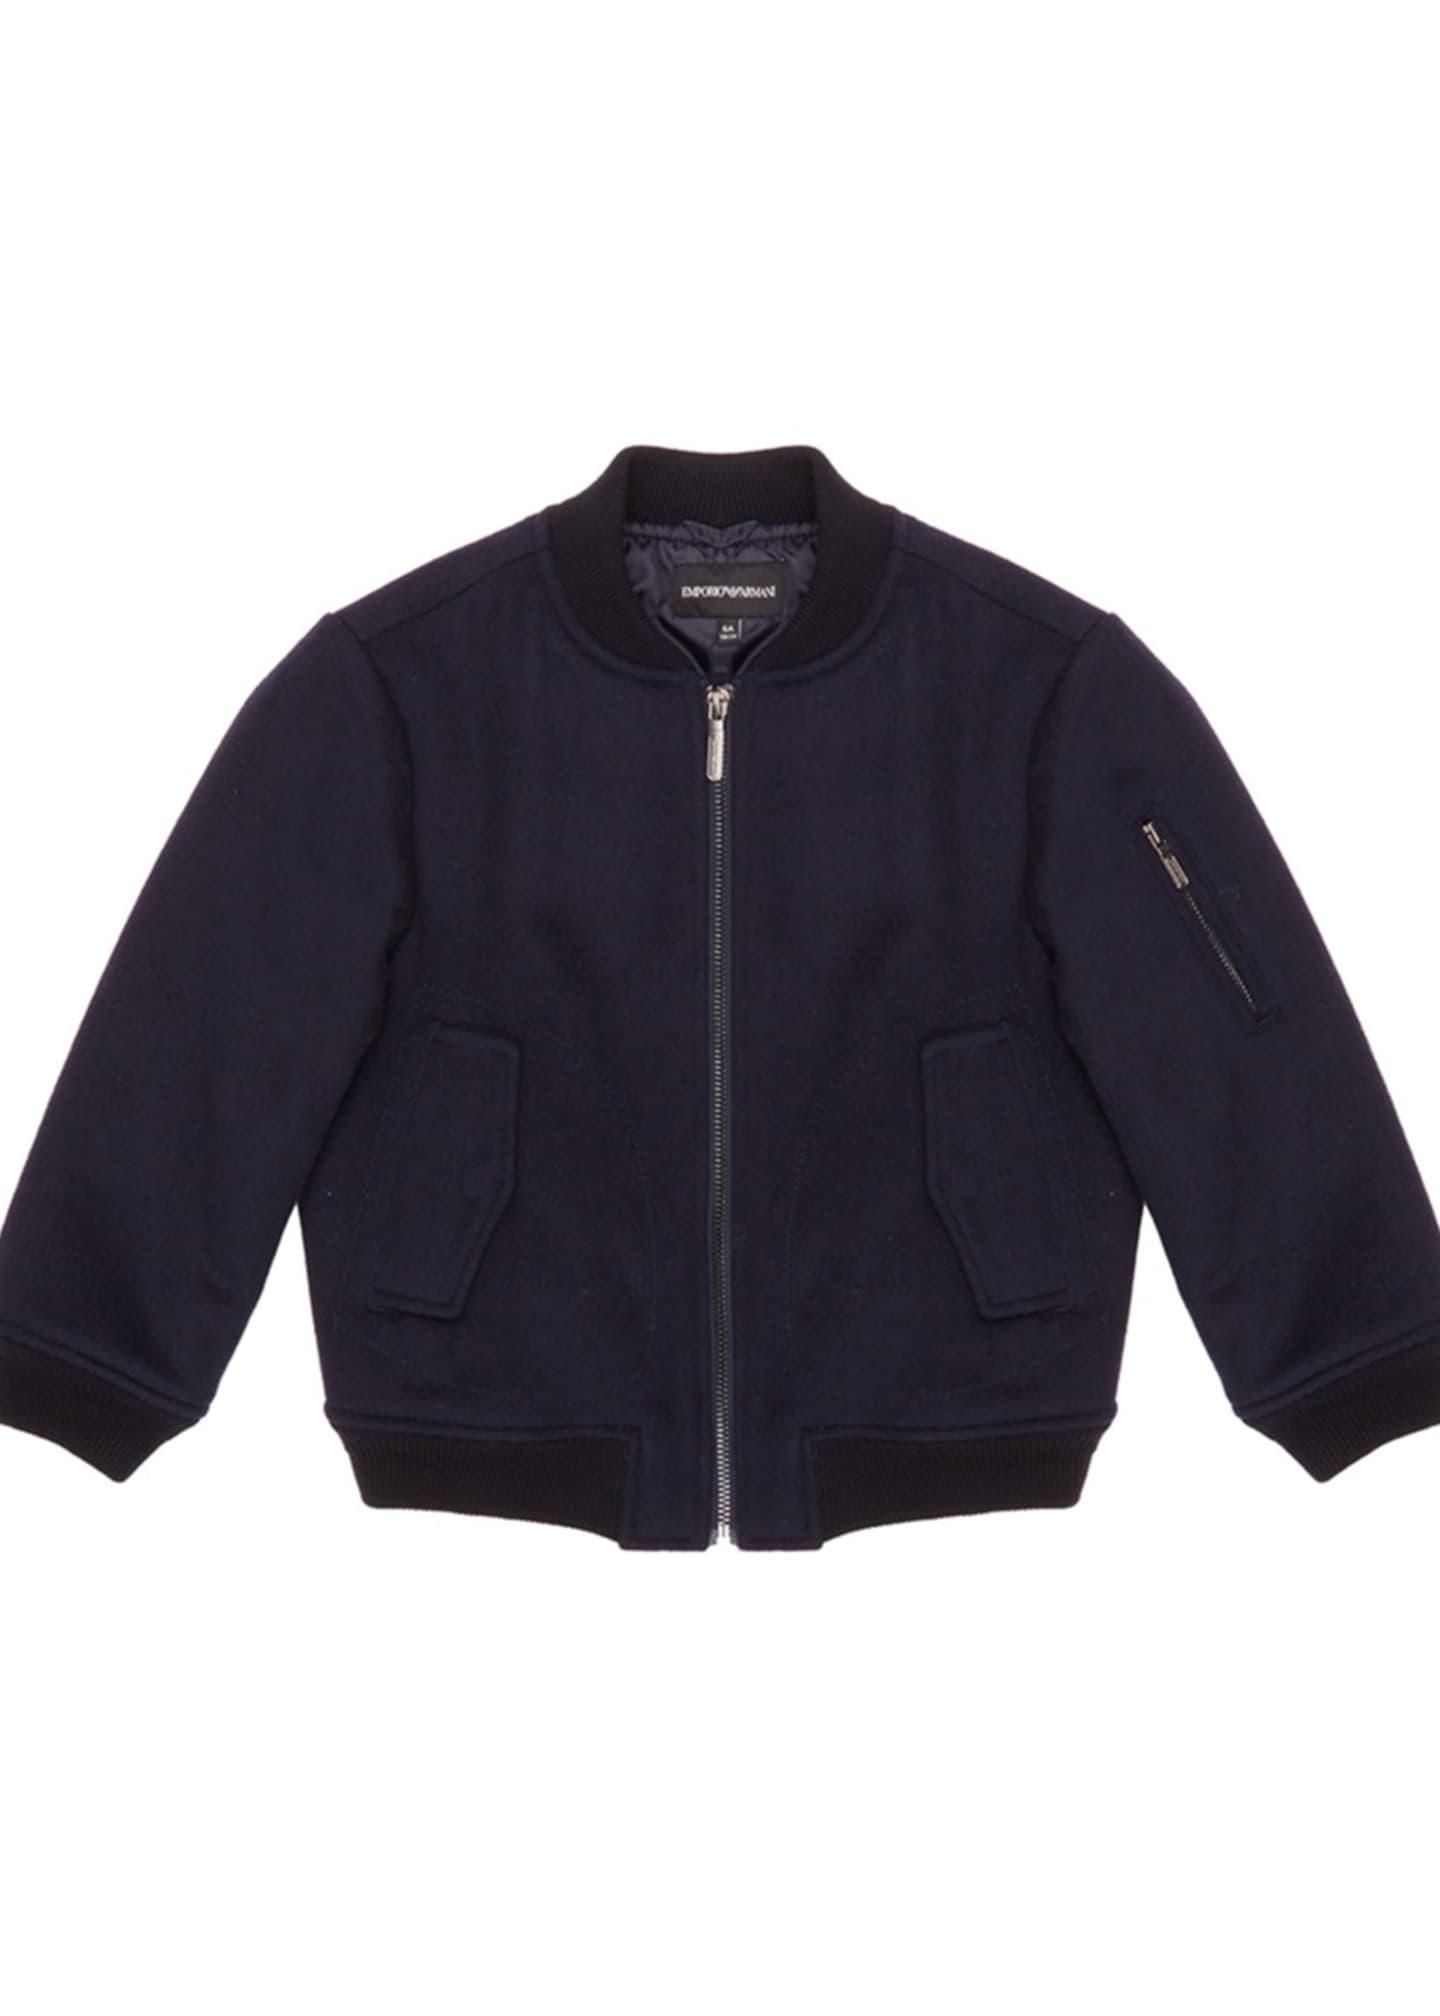 Emporio Armani Boy's Bomber Jacket, Size 6-16